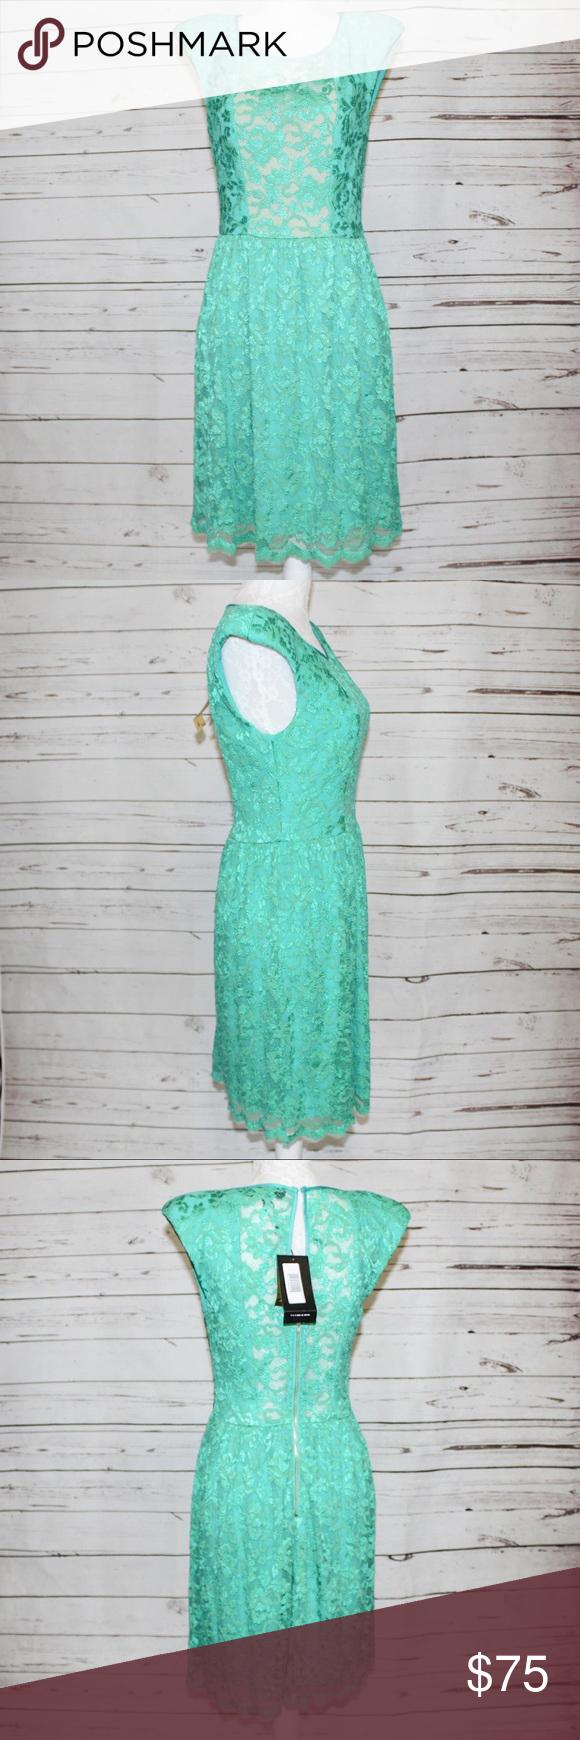 ABS Allen Schwartz Green Lace Overlay Dress NWT ABS Allen